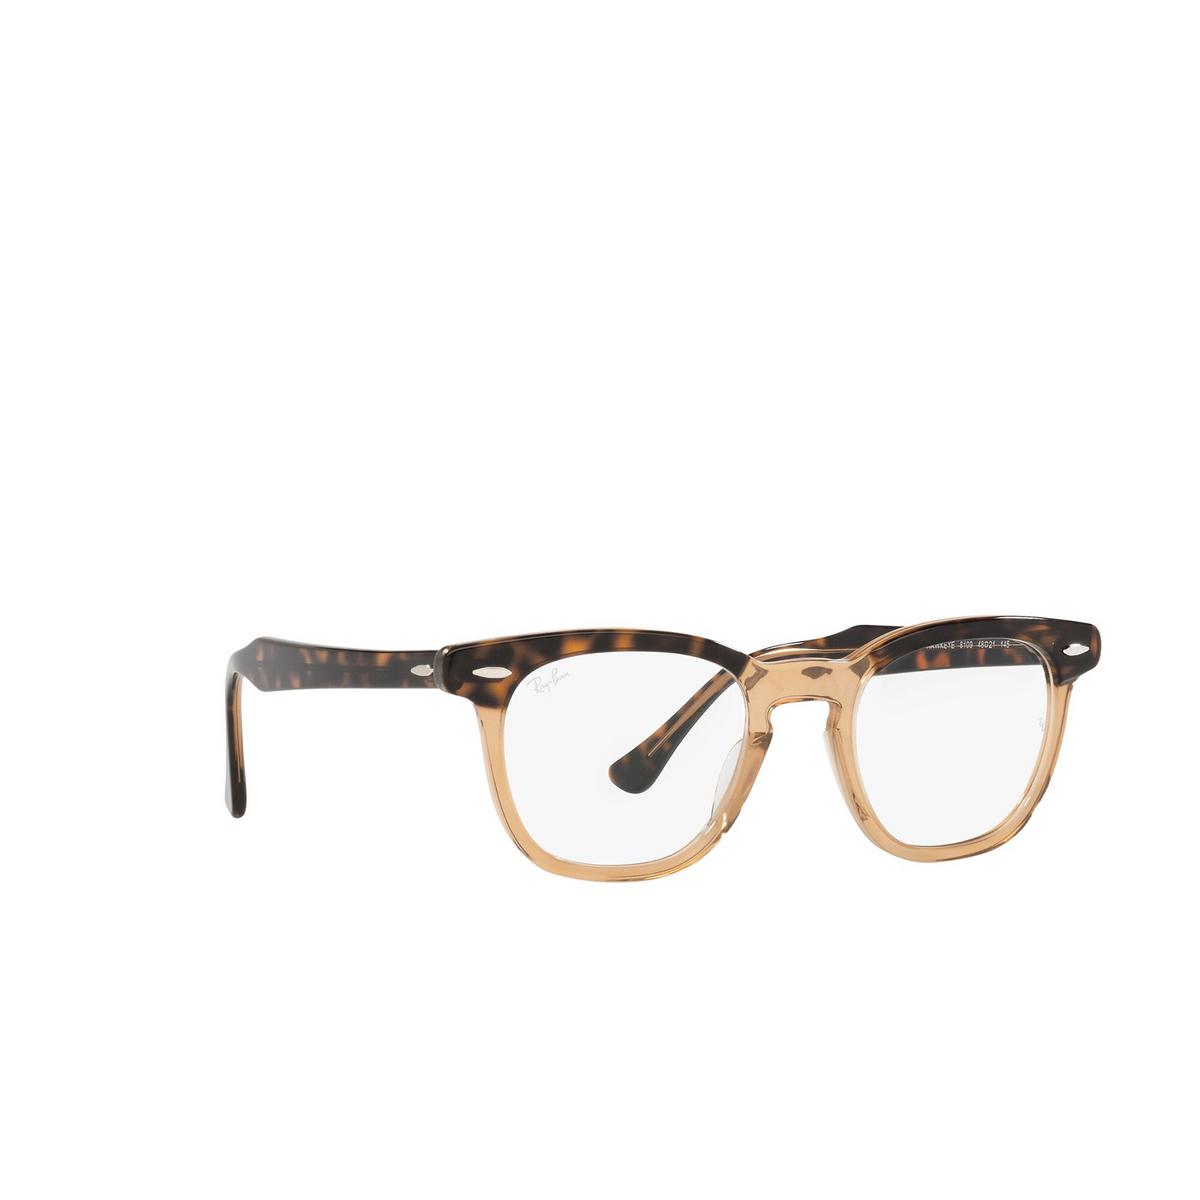 Ray-Ban® Square Eyeglasses: Hawkeye RX5398 color Havana On Transparent Brown 8109 - three-quarters view.